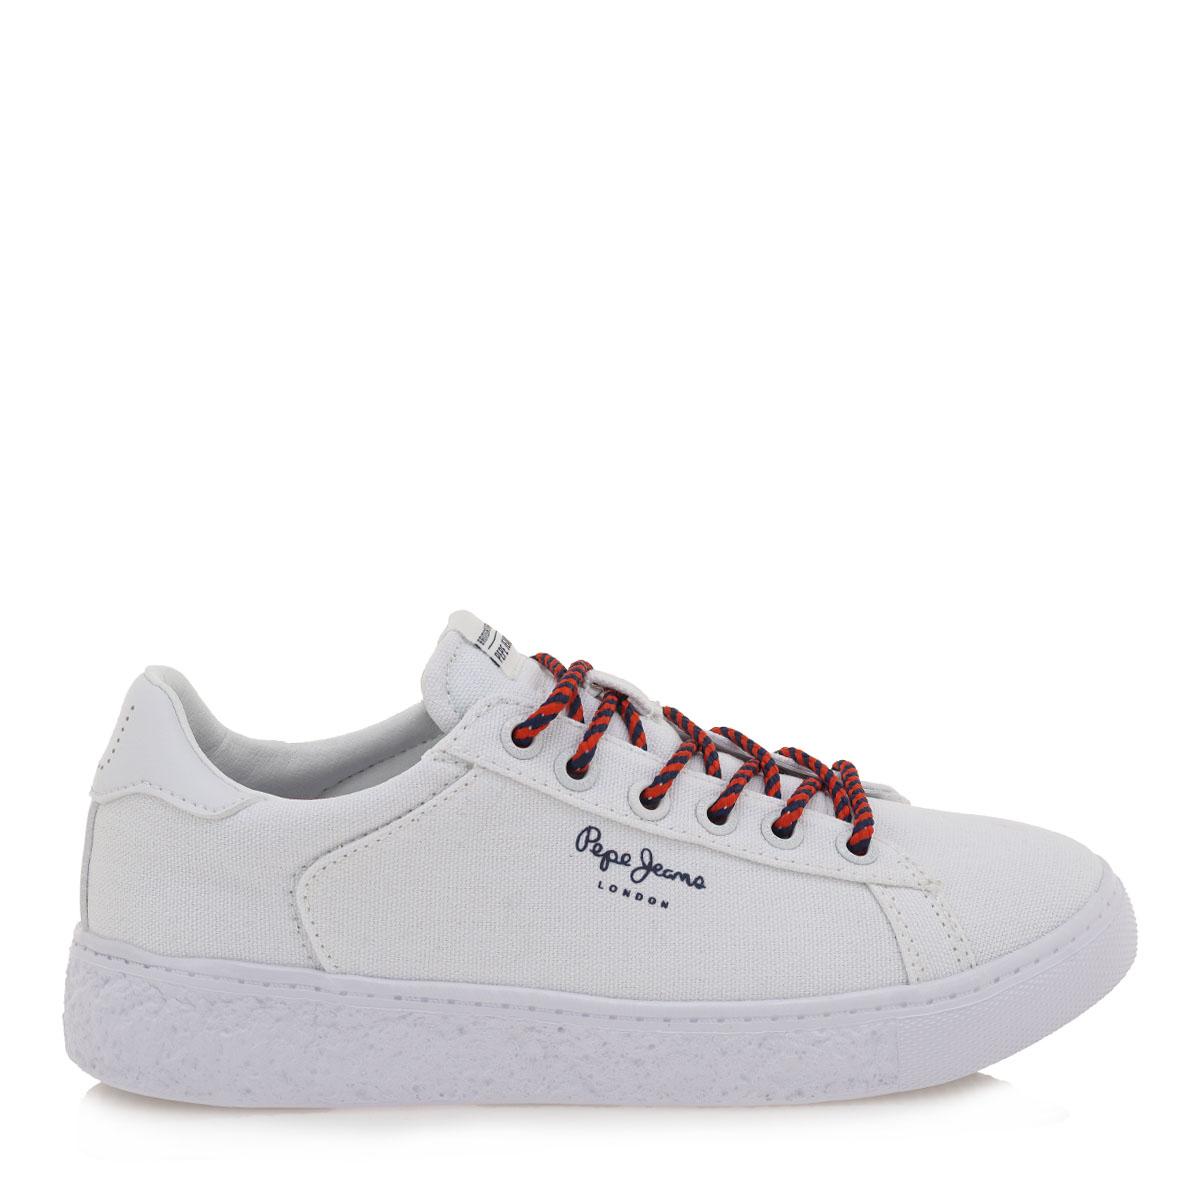 Pepe jeans. TsakirisMallas SNEAKERS σχέδιο  I10638552 3455c63b5f4